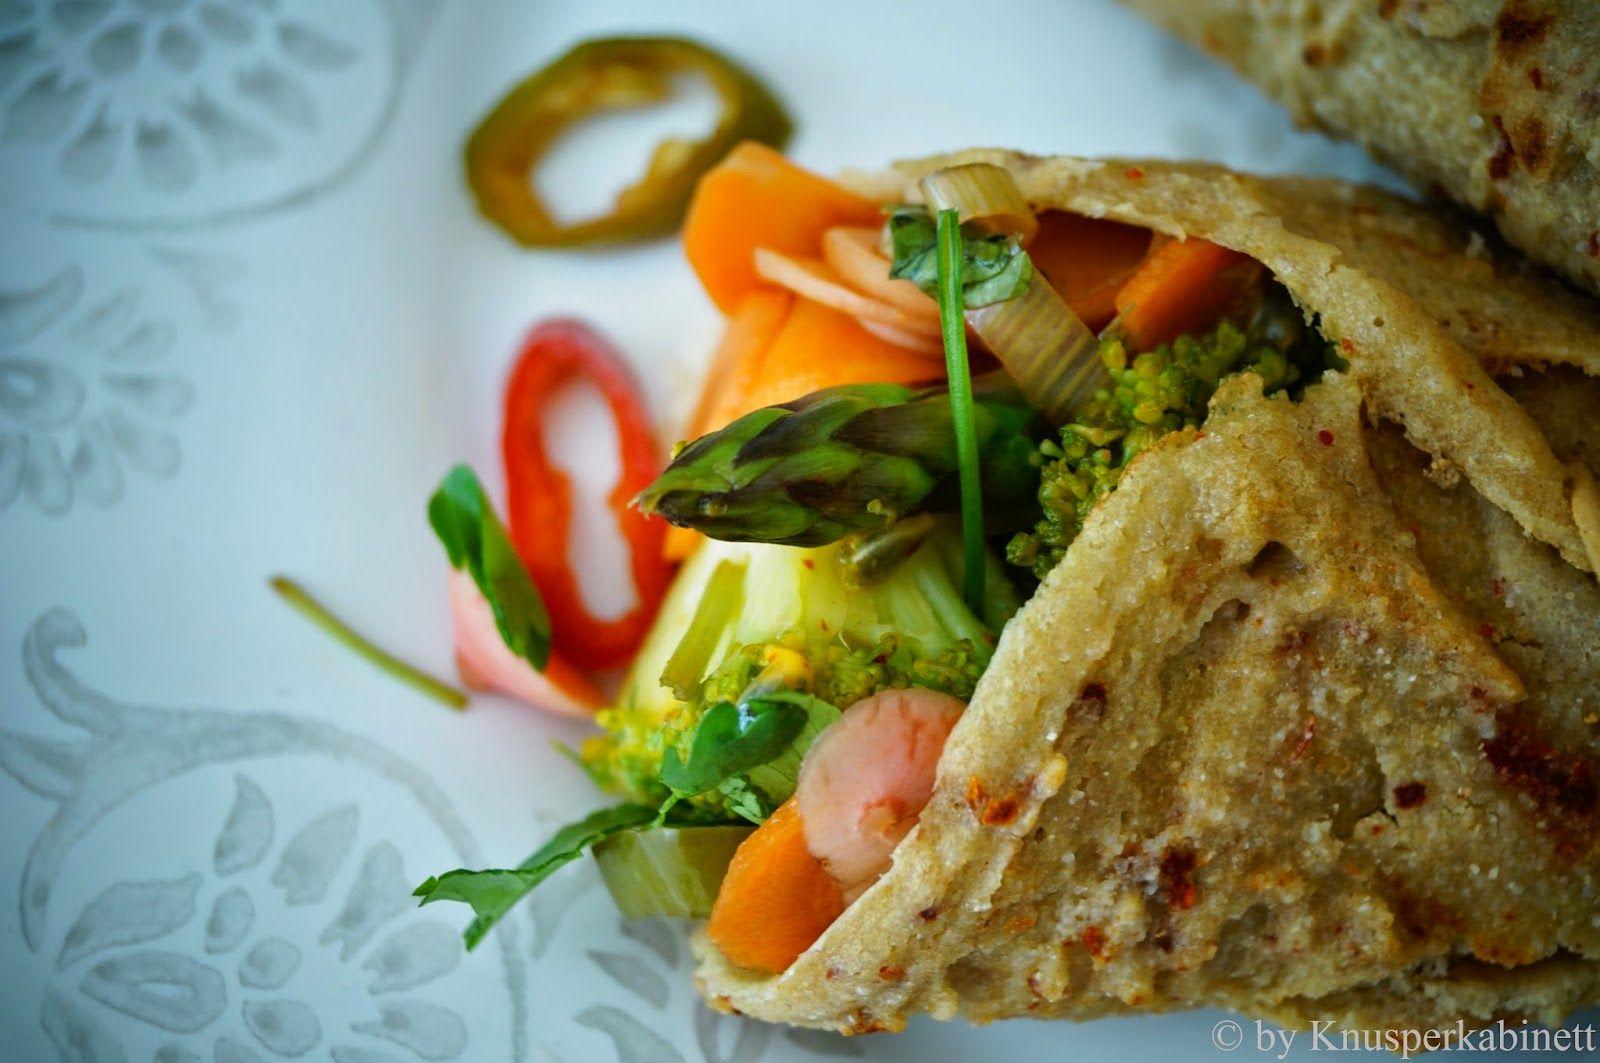 KNUSPERKABINETT: Vegan and gluten-free tortillas of Quinoa with green vegetables and filling Mexican Pickles